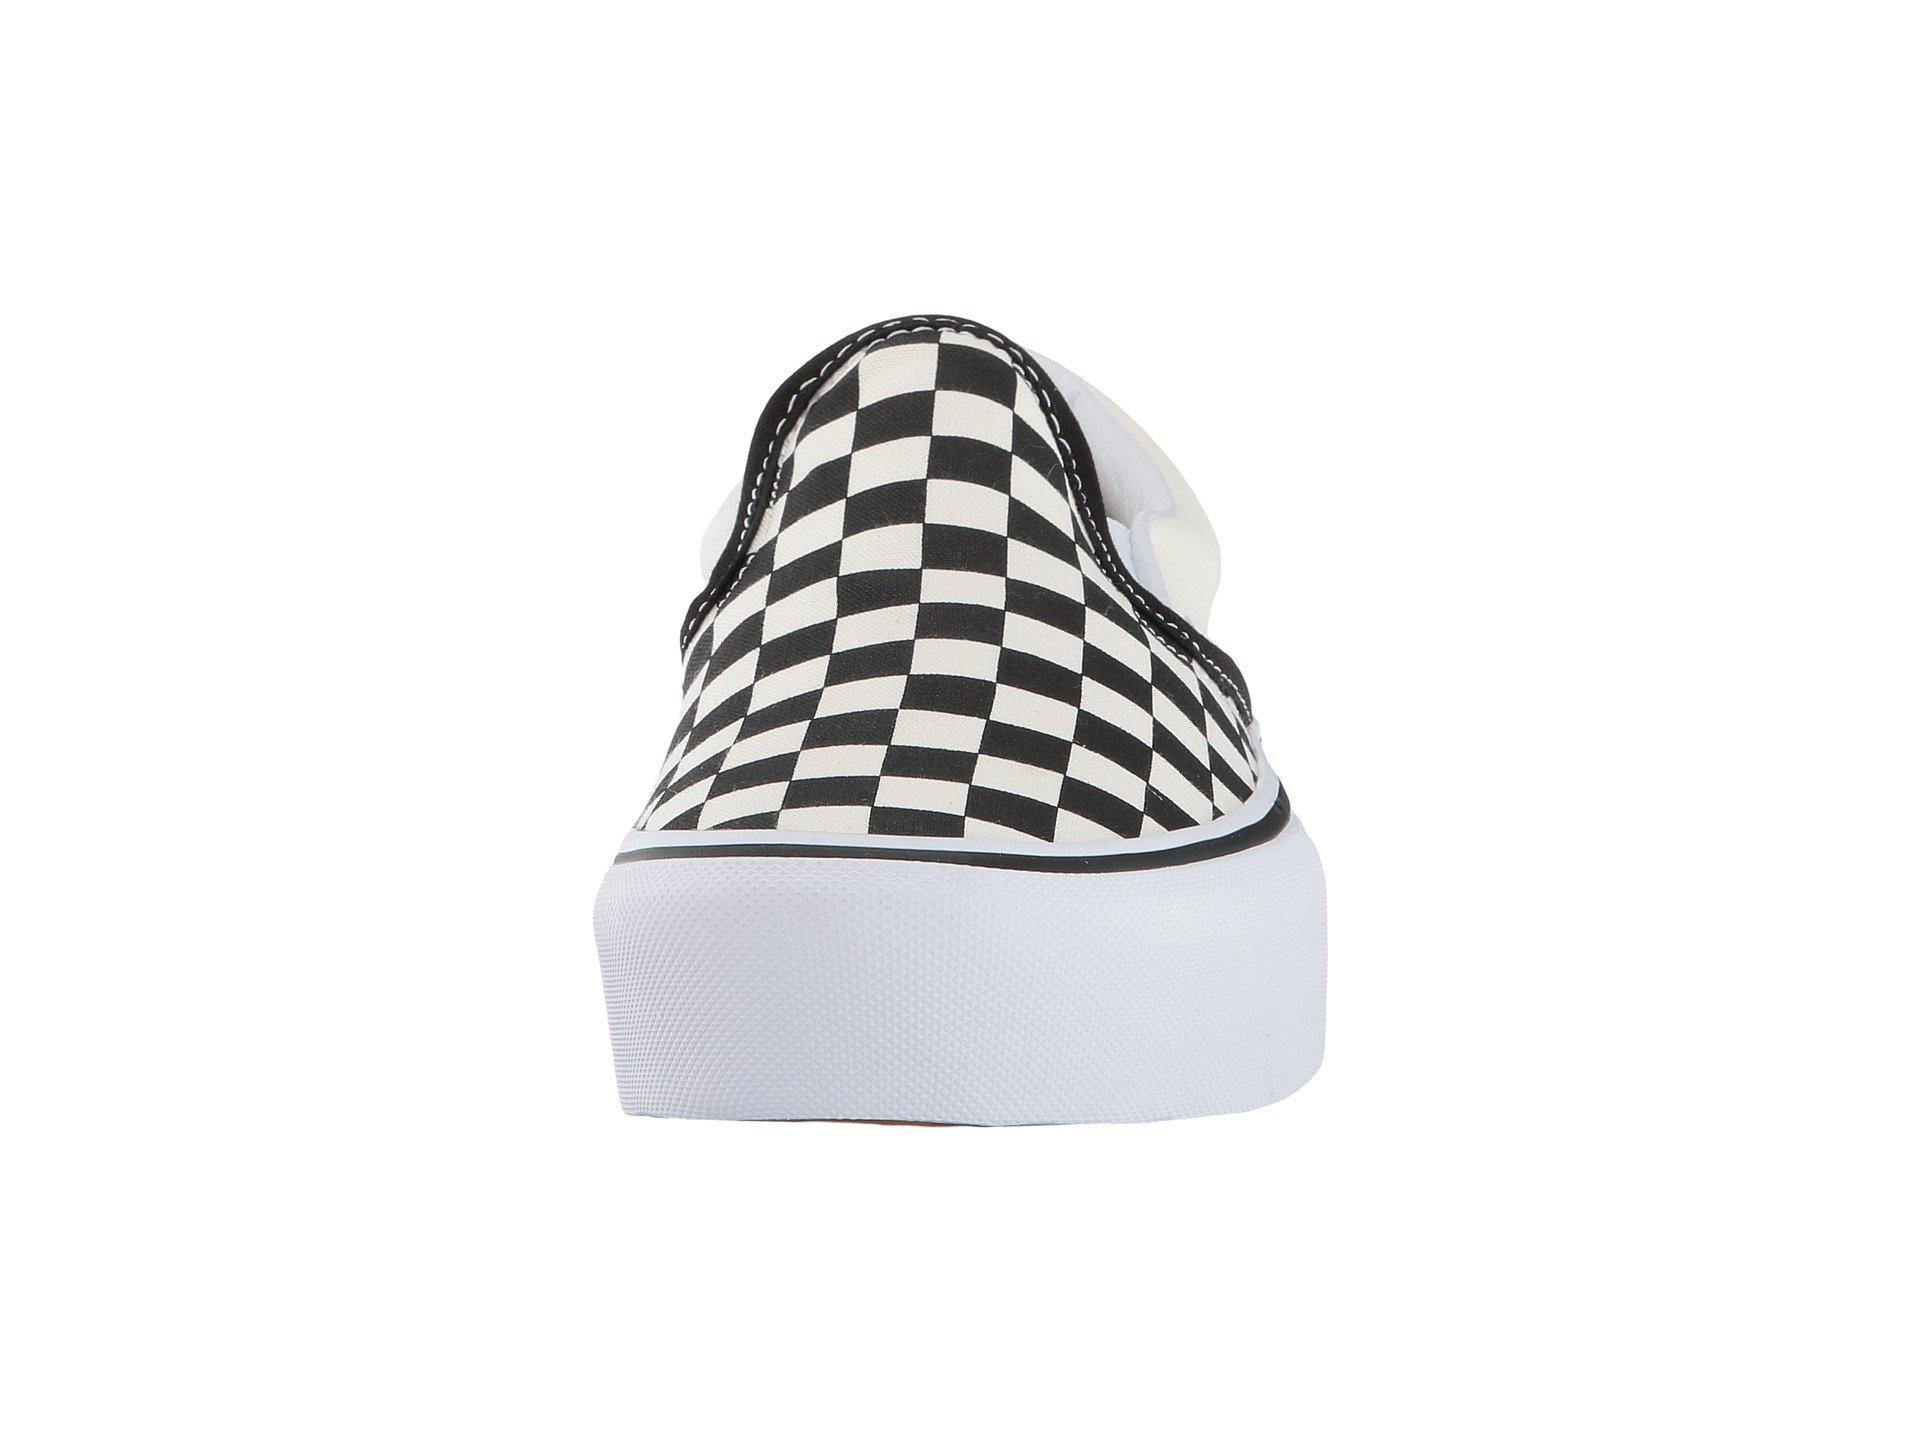 397474bb72f Lyst - Vans Women s Checkerboard Slip-on Platform Sneakers in White ...